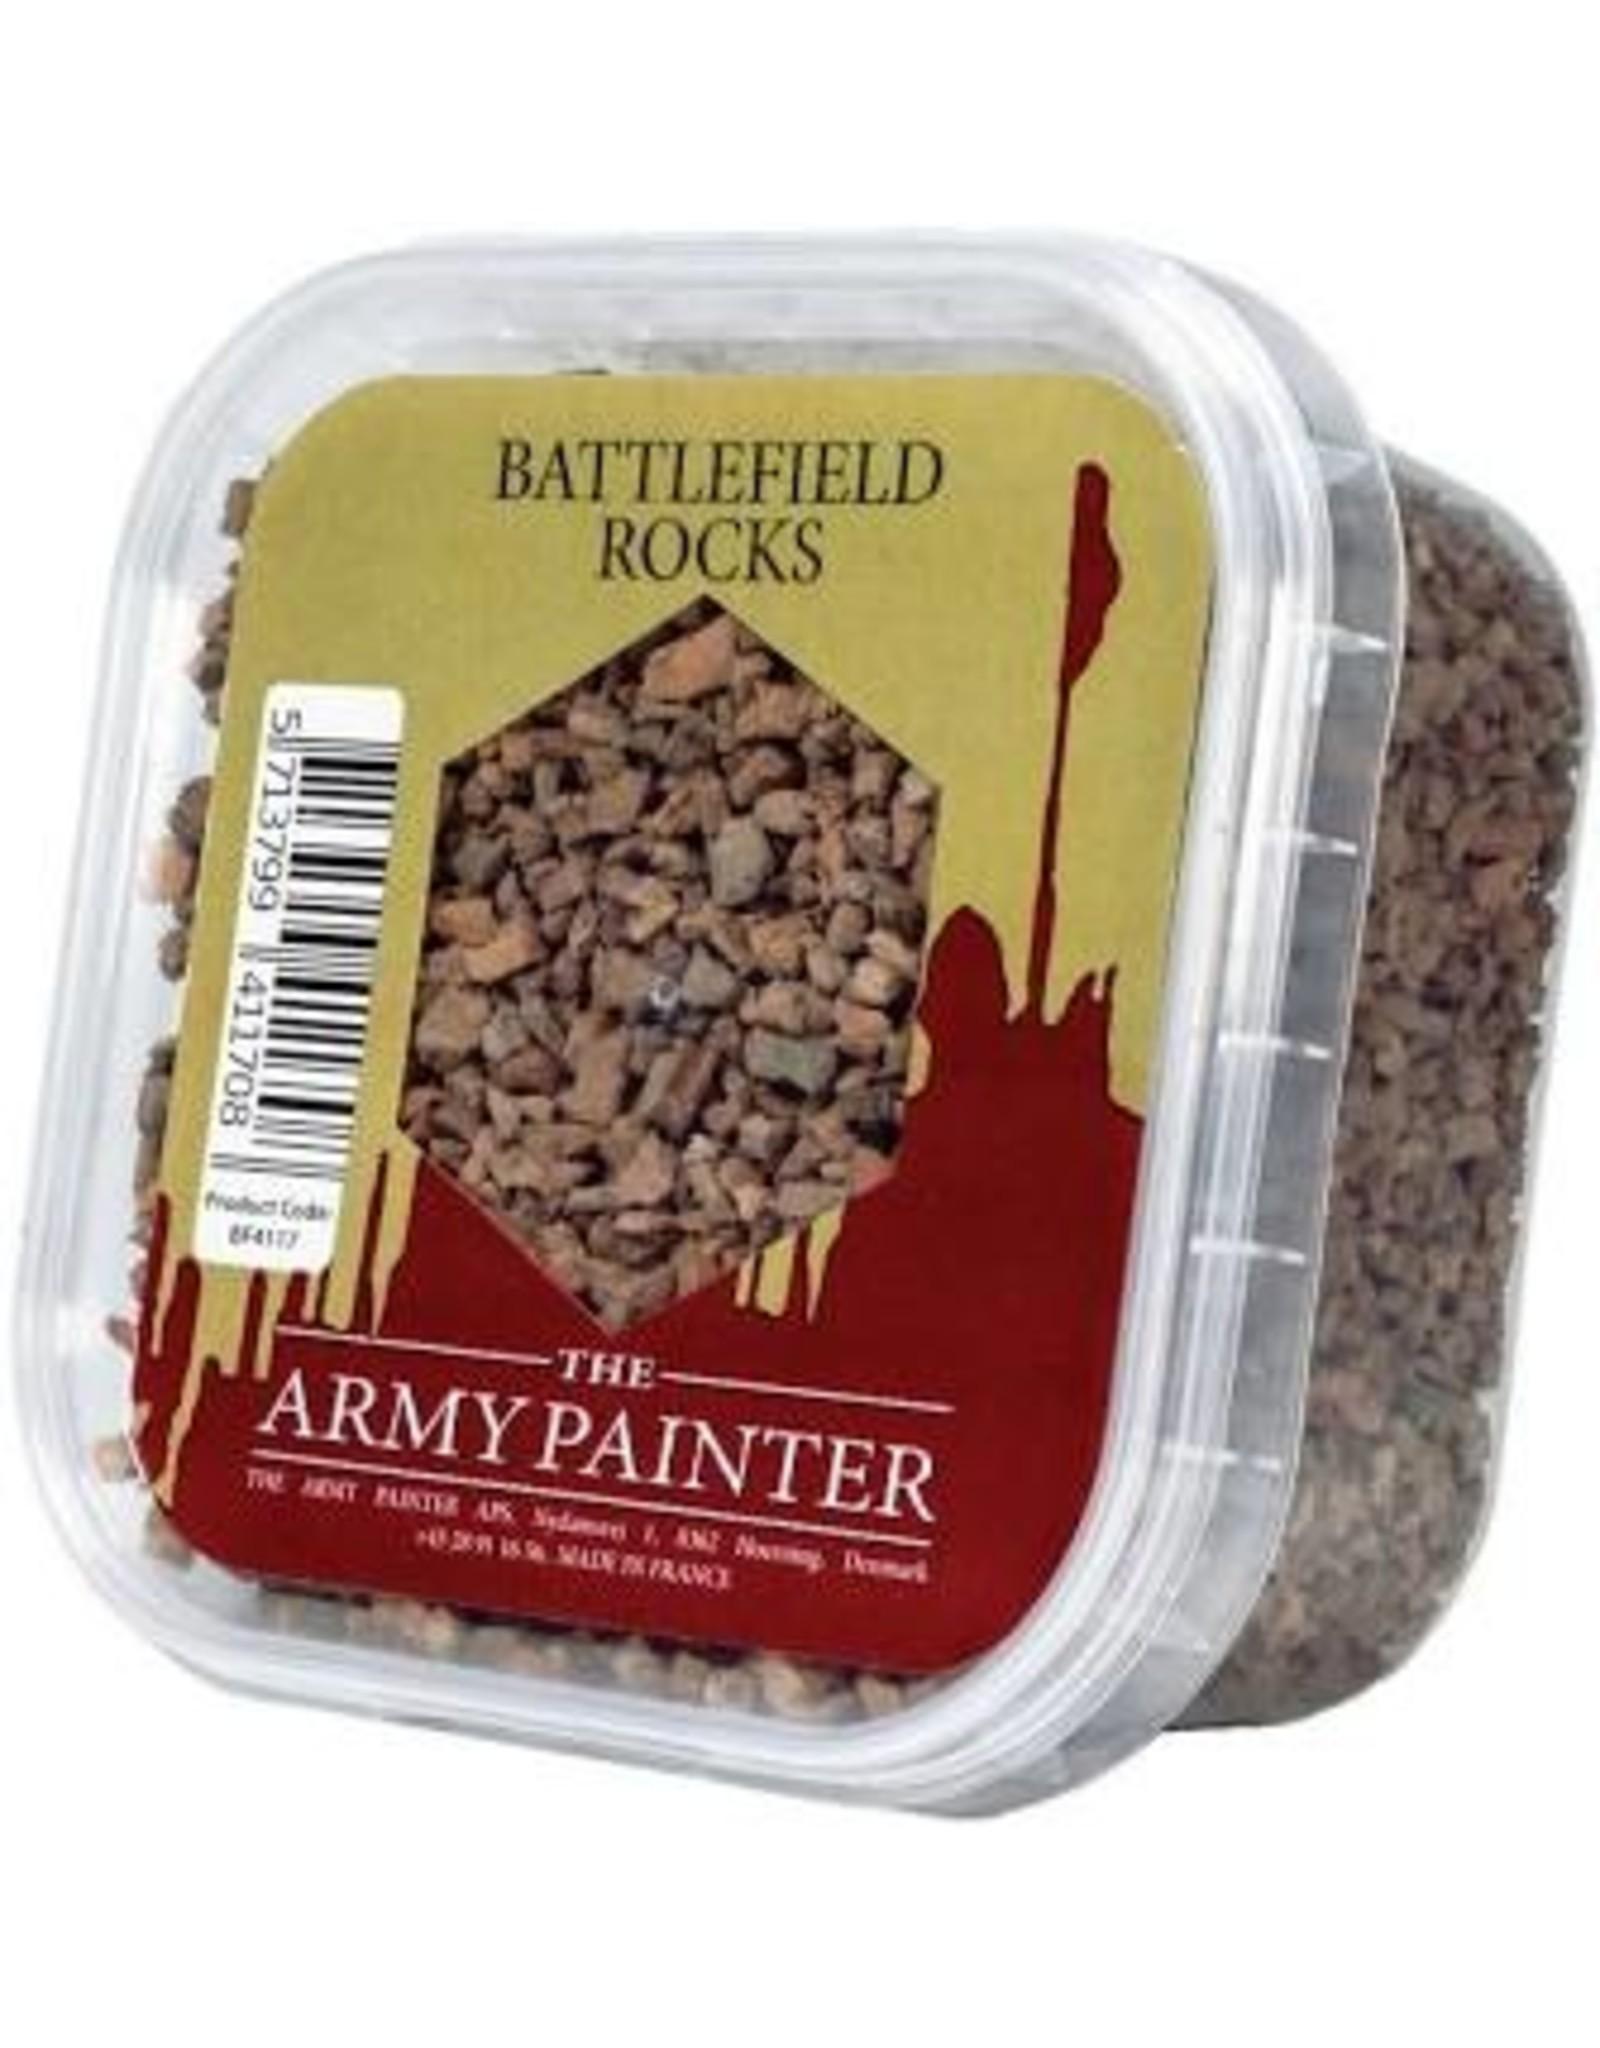 Army Painter Battlefield Rocks Basing